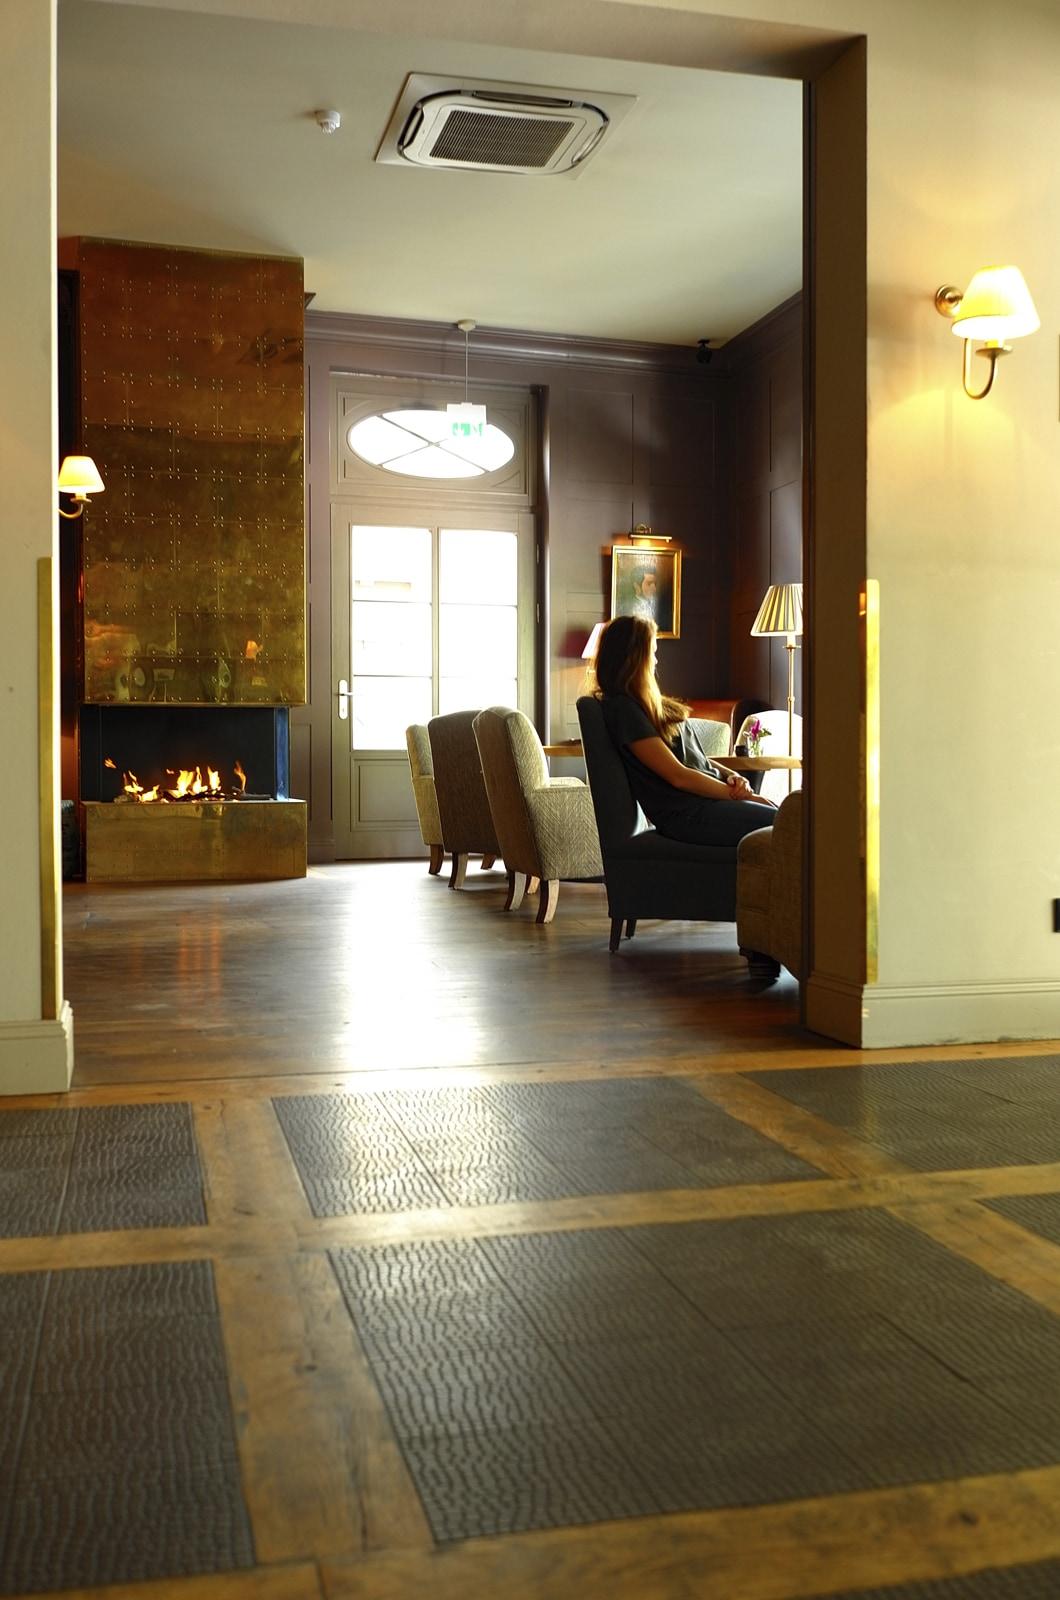 zementfliesen-VIA_zementmosaikplatten-nr.40760-hotel-monbijou-03-viaplatten | 40760